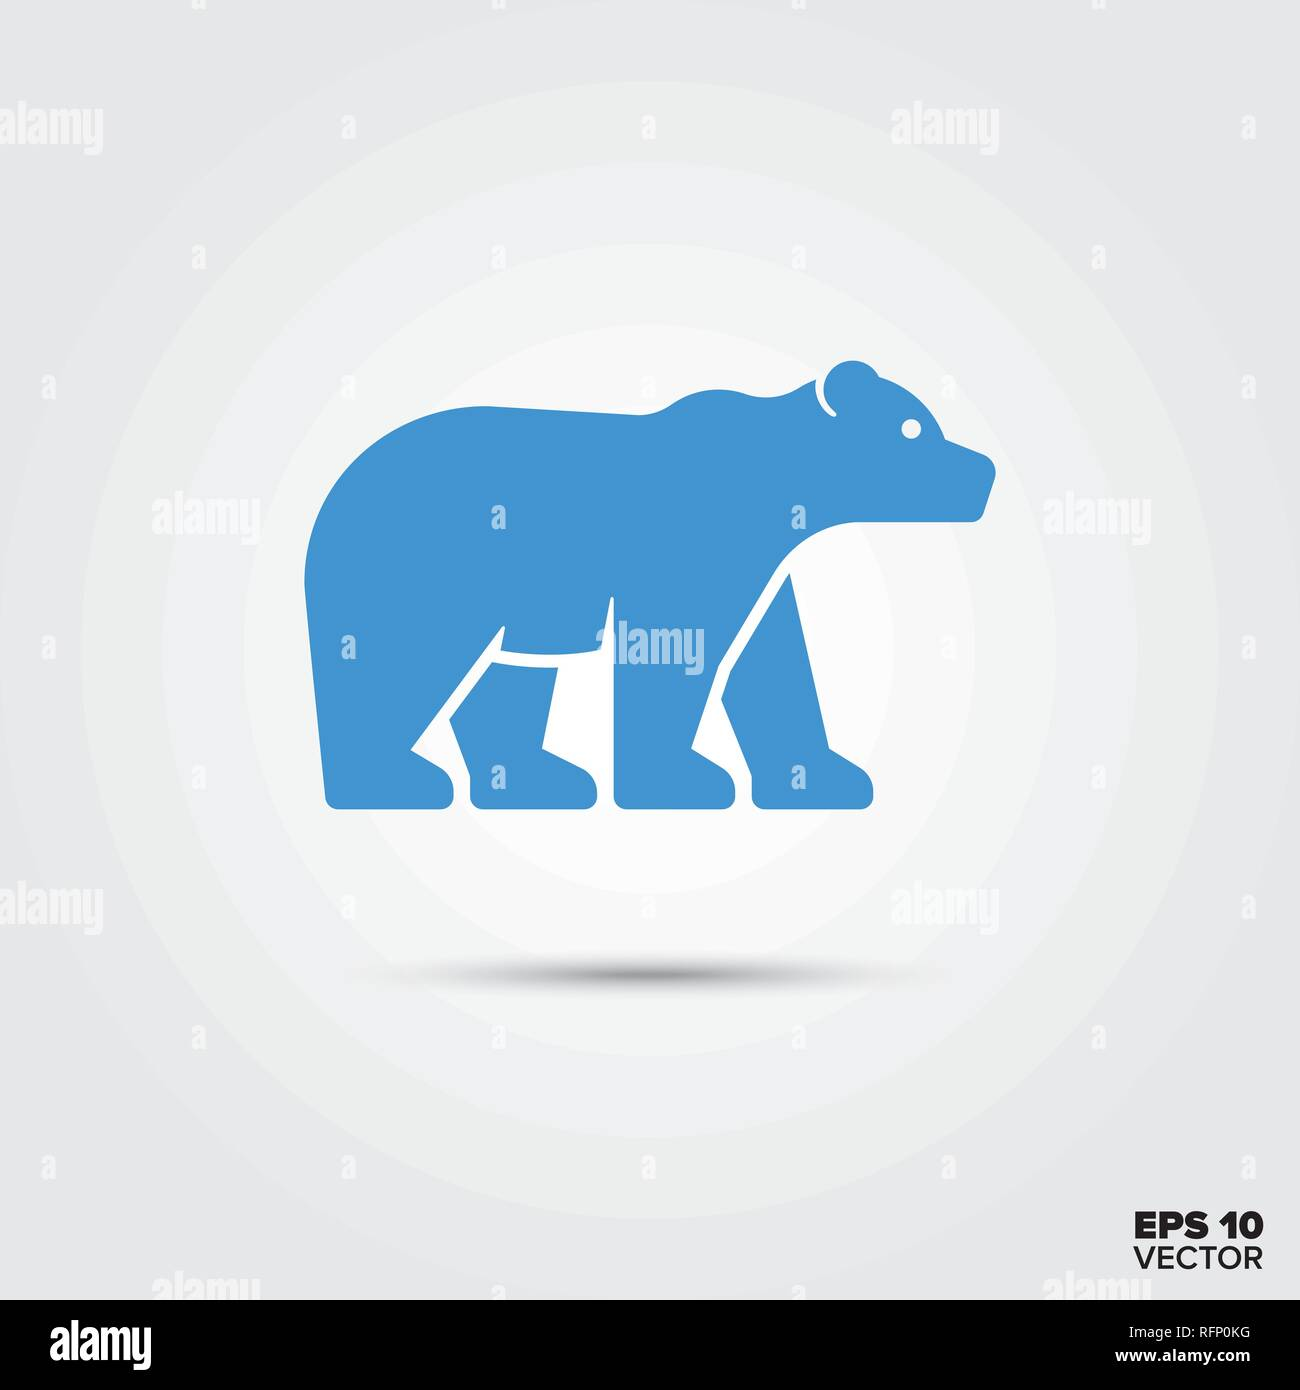 Polar bear icon, Global warming and endangered species symbol. EPS 10 Vector. - Stock Vector